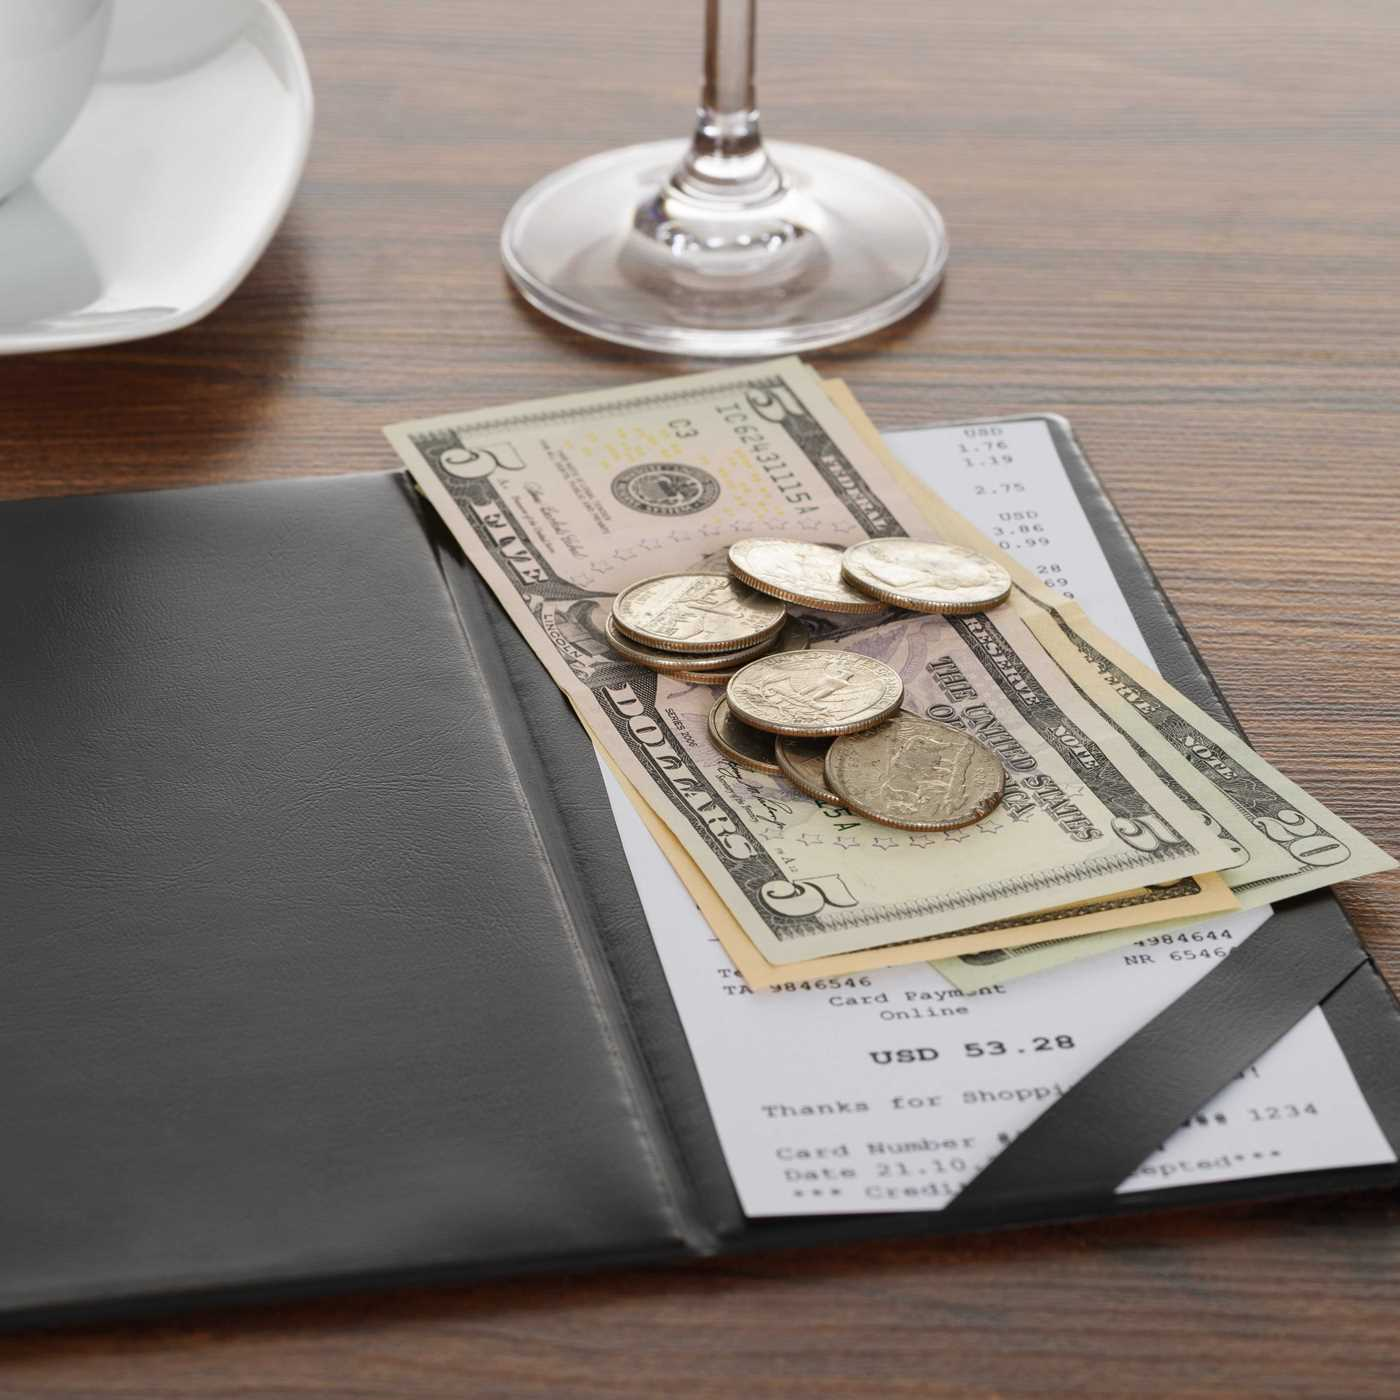 how to get a waiter job